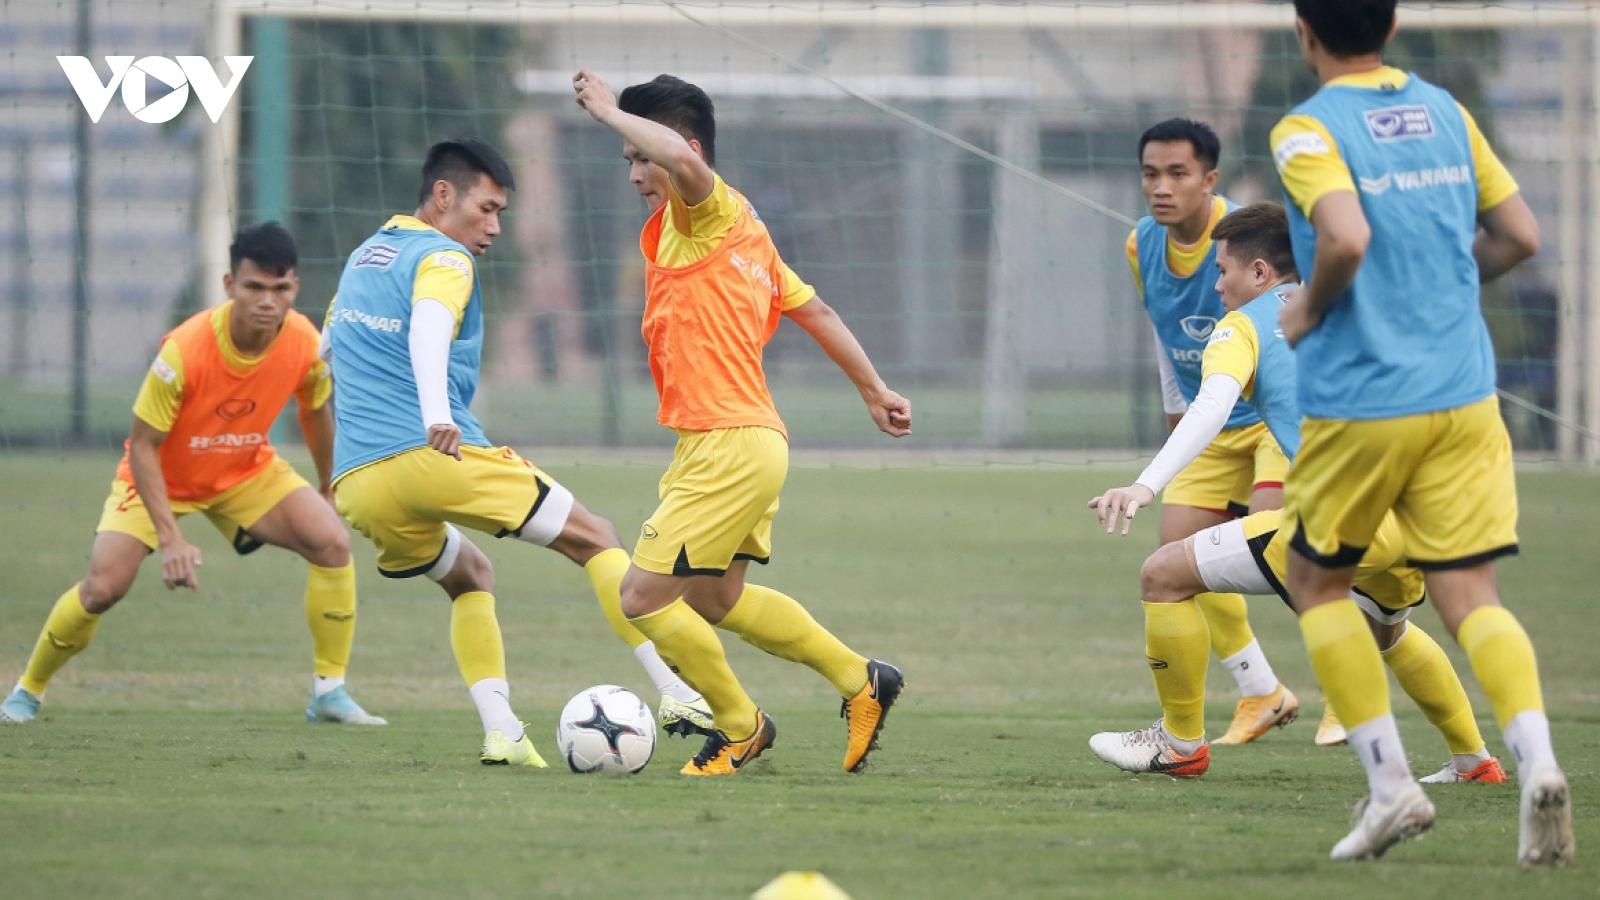 National team launch training camp in Hanoi